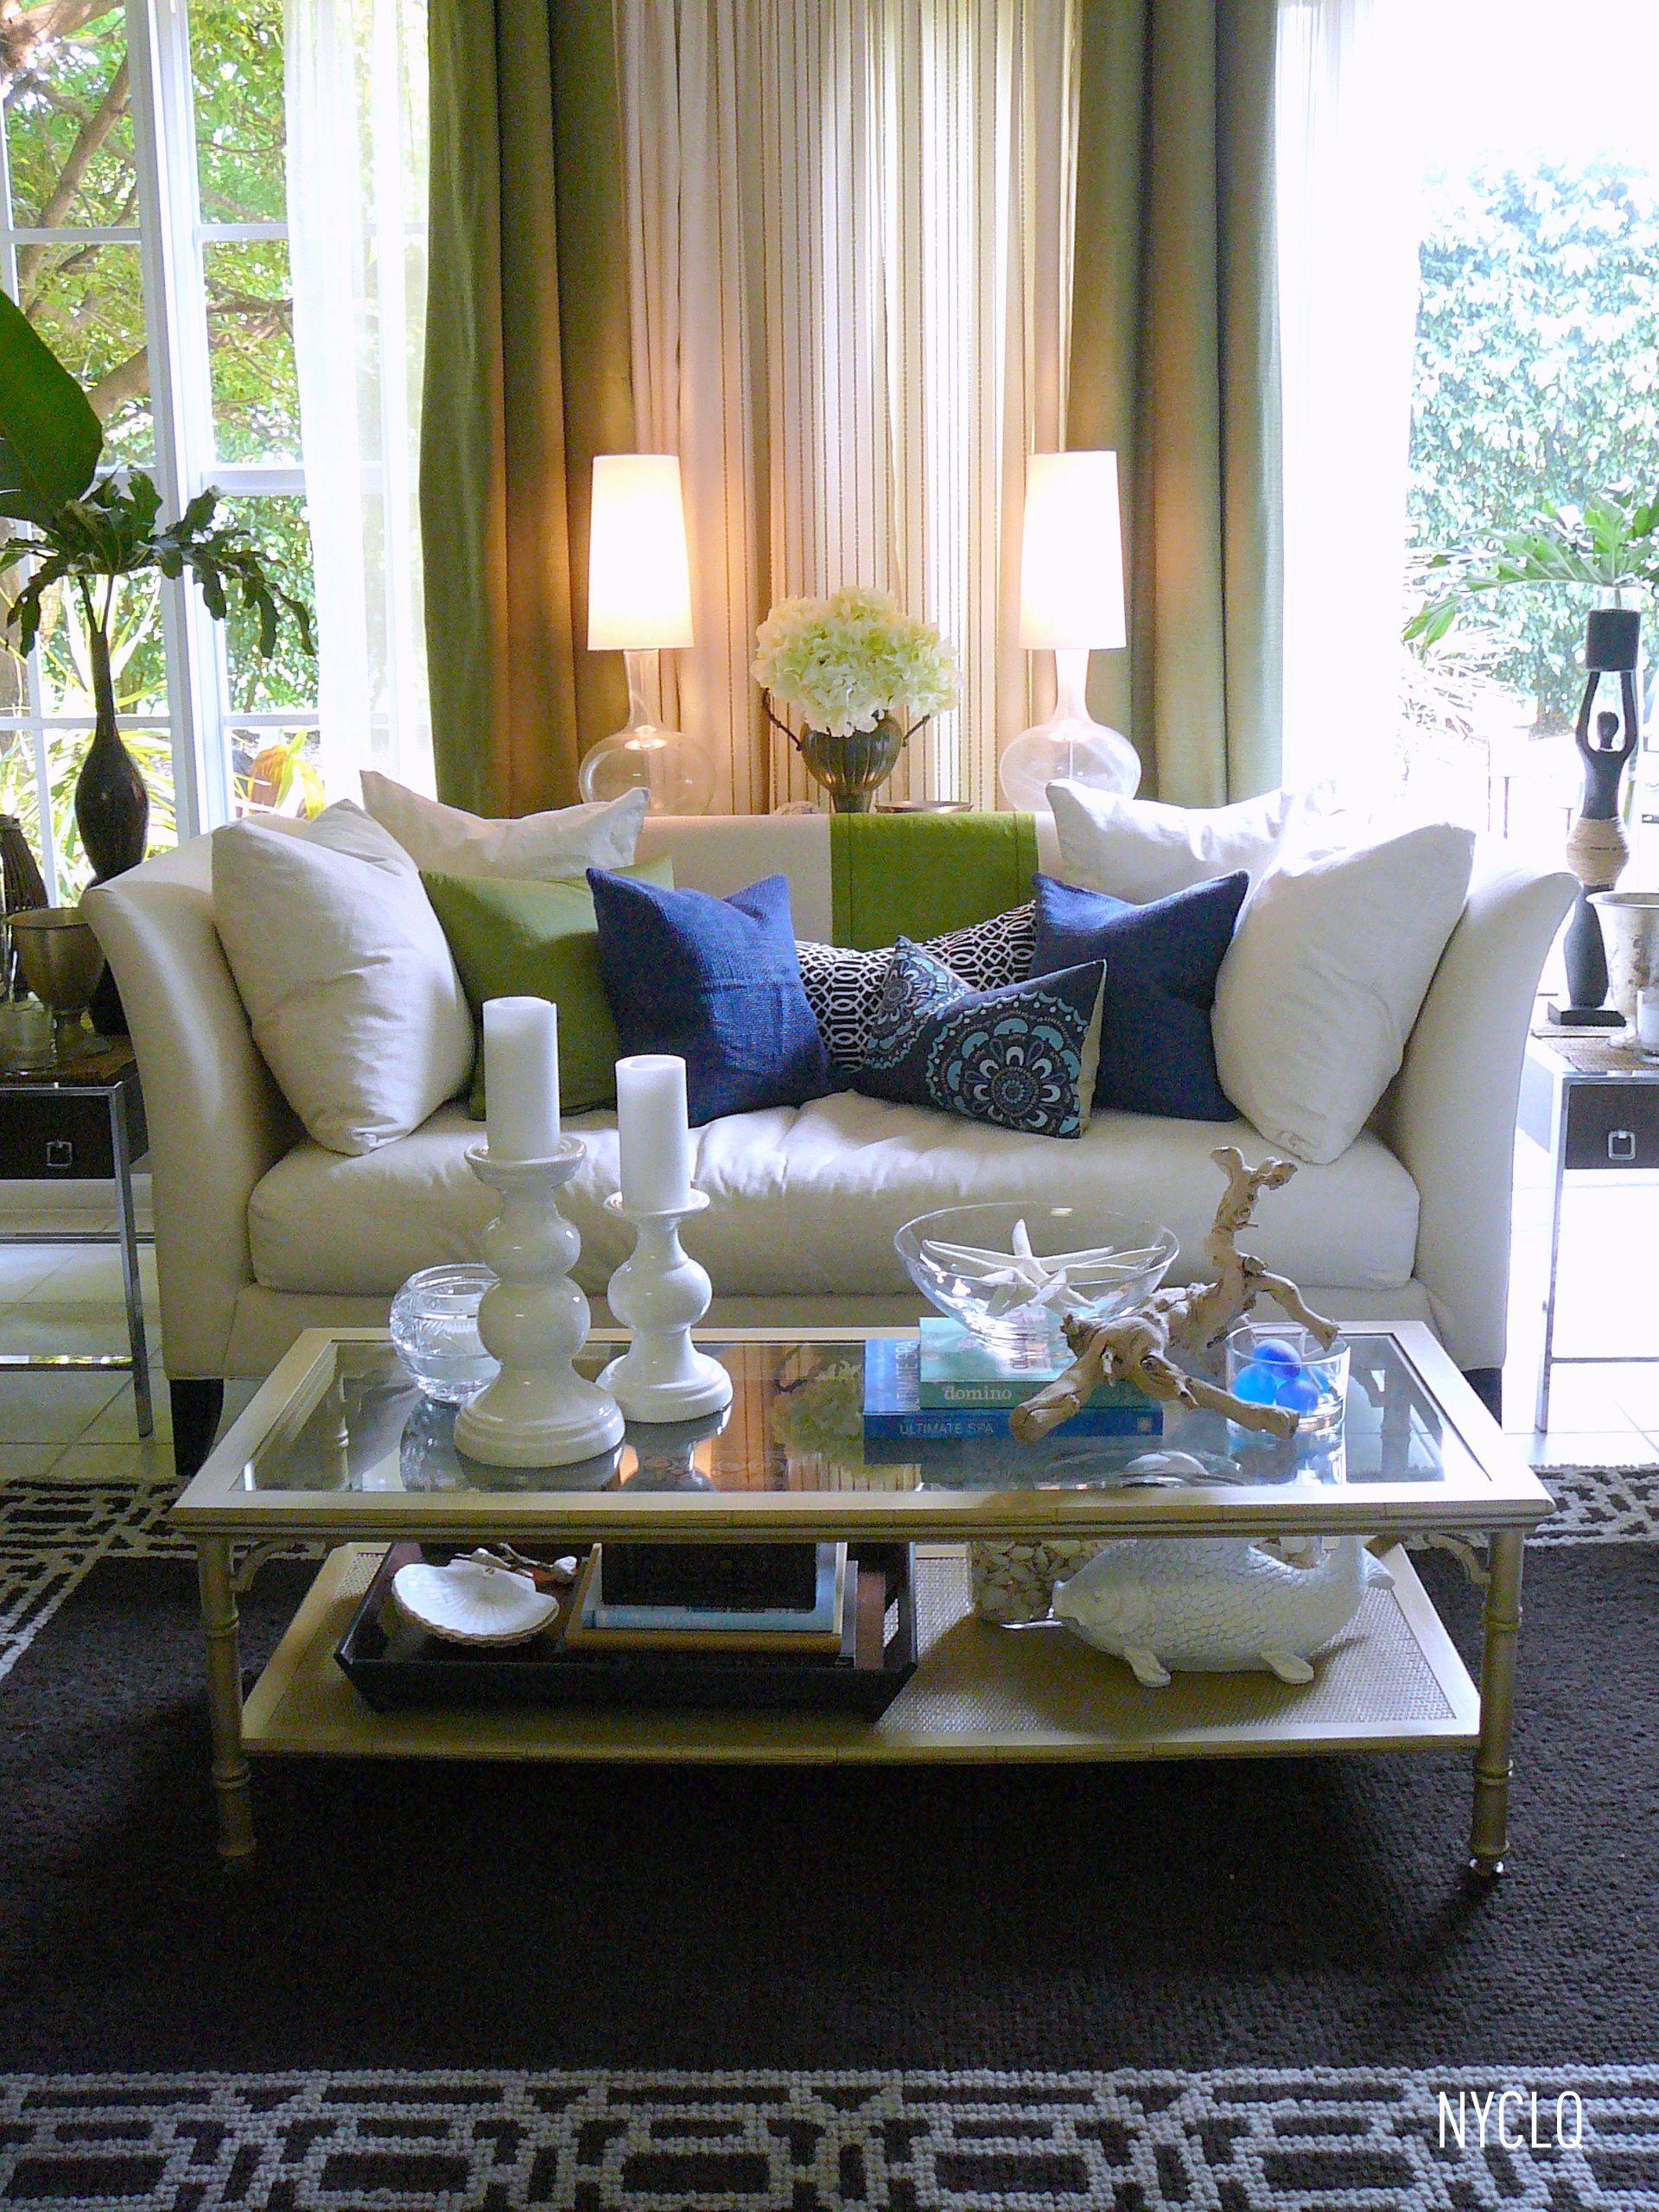 Shop home decor chevron stripes pillow from shop home decor - Pepupstreet Com Throw Pillows Home Decor Home Decor Ideas